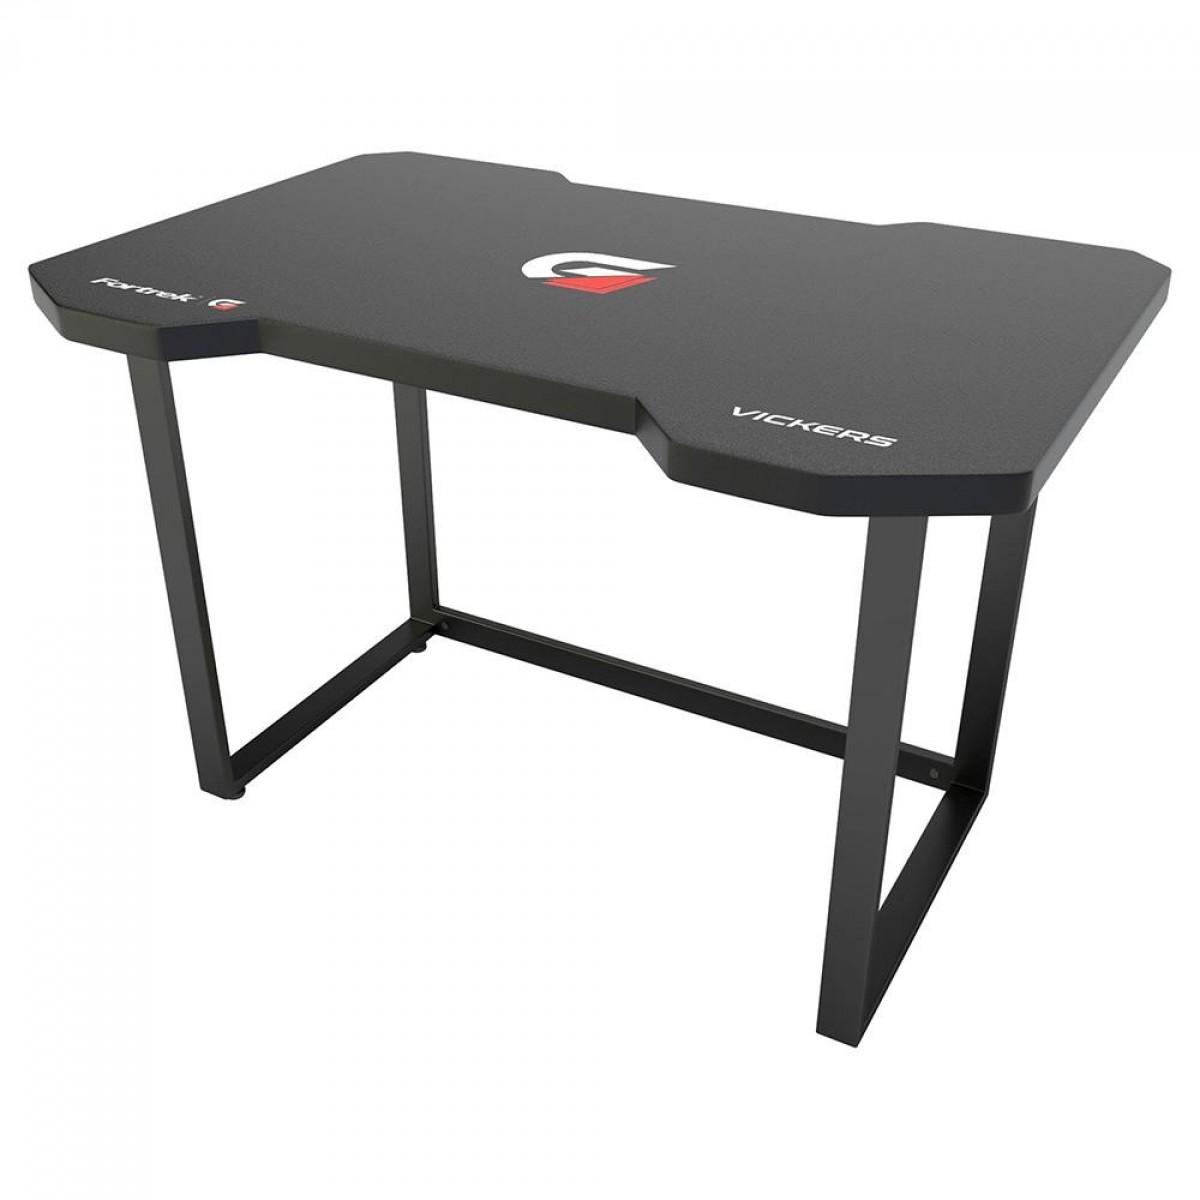 Mesa Gamer Fortrek Vickers, Black/Red, B27MM